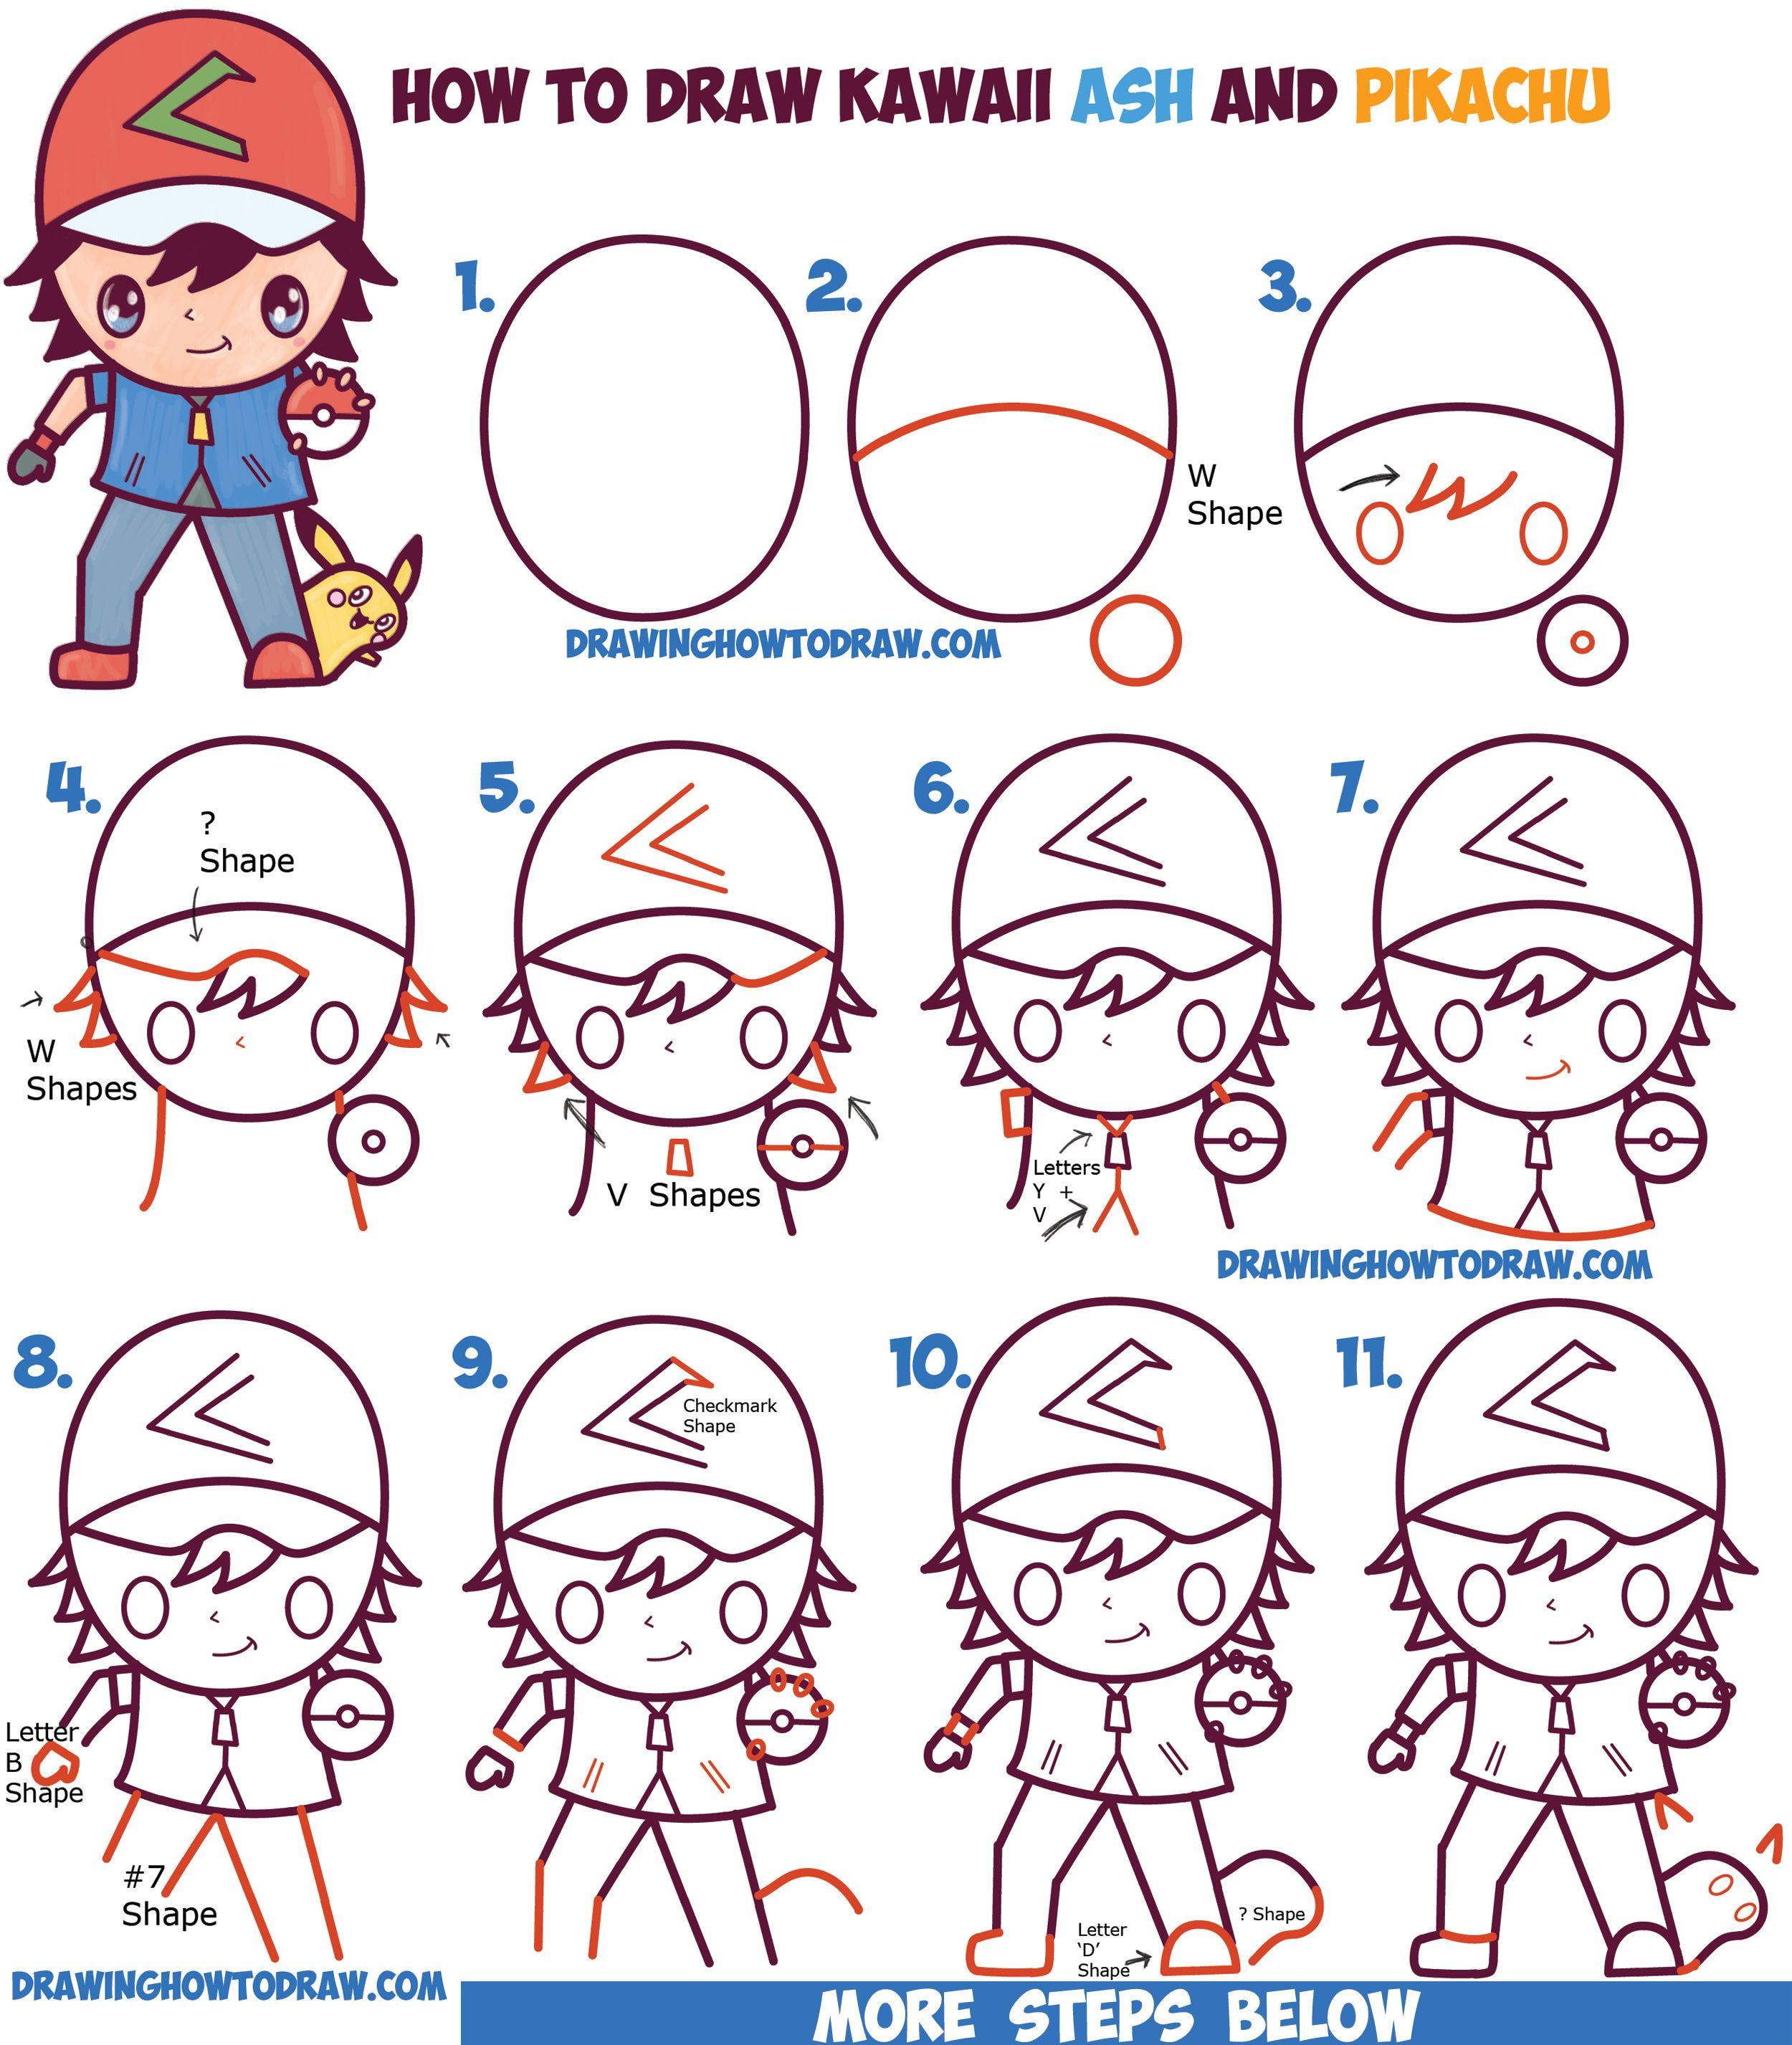 2500x2853 How To Draw Cute Kawaii Chibi Ash Ketchum And Pikachu From Pokemon